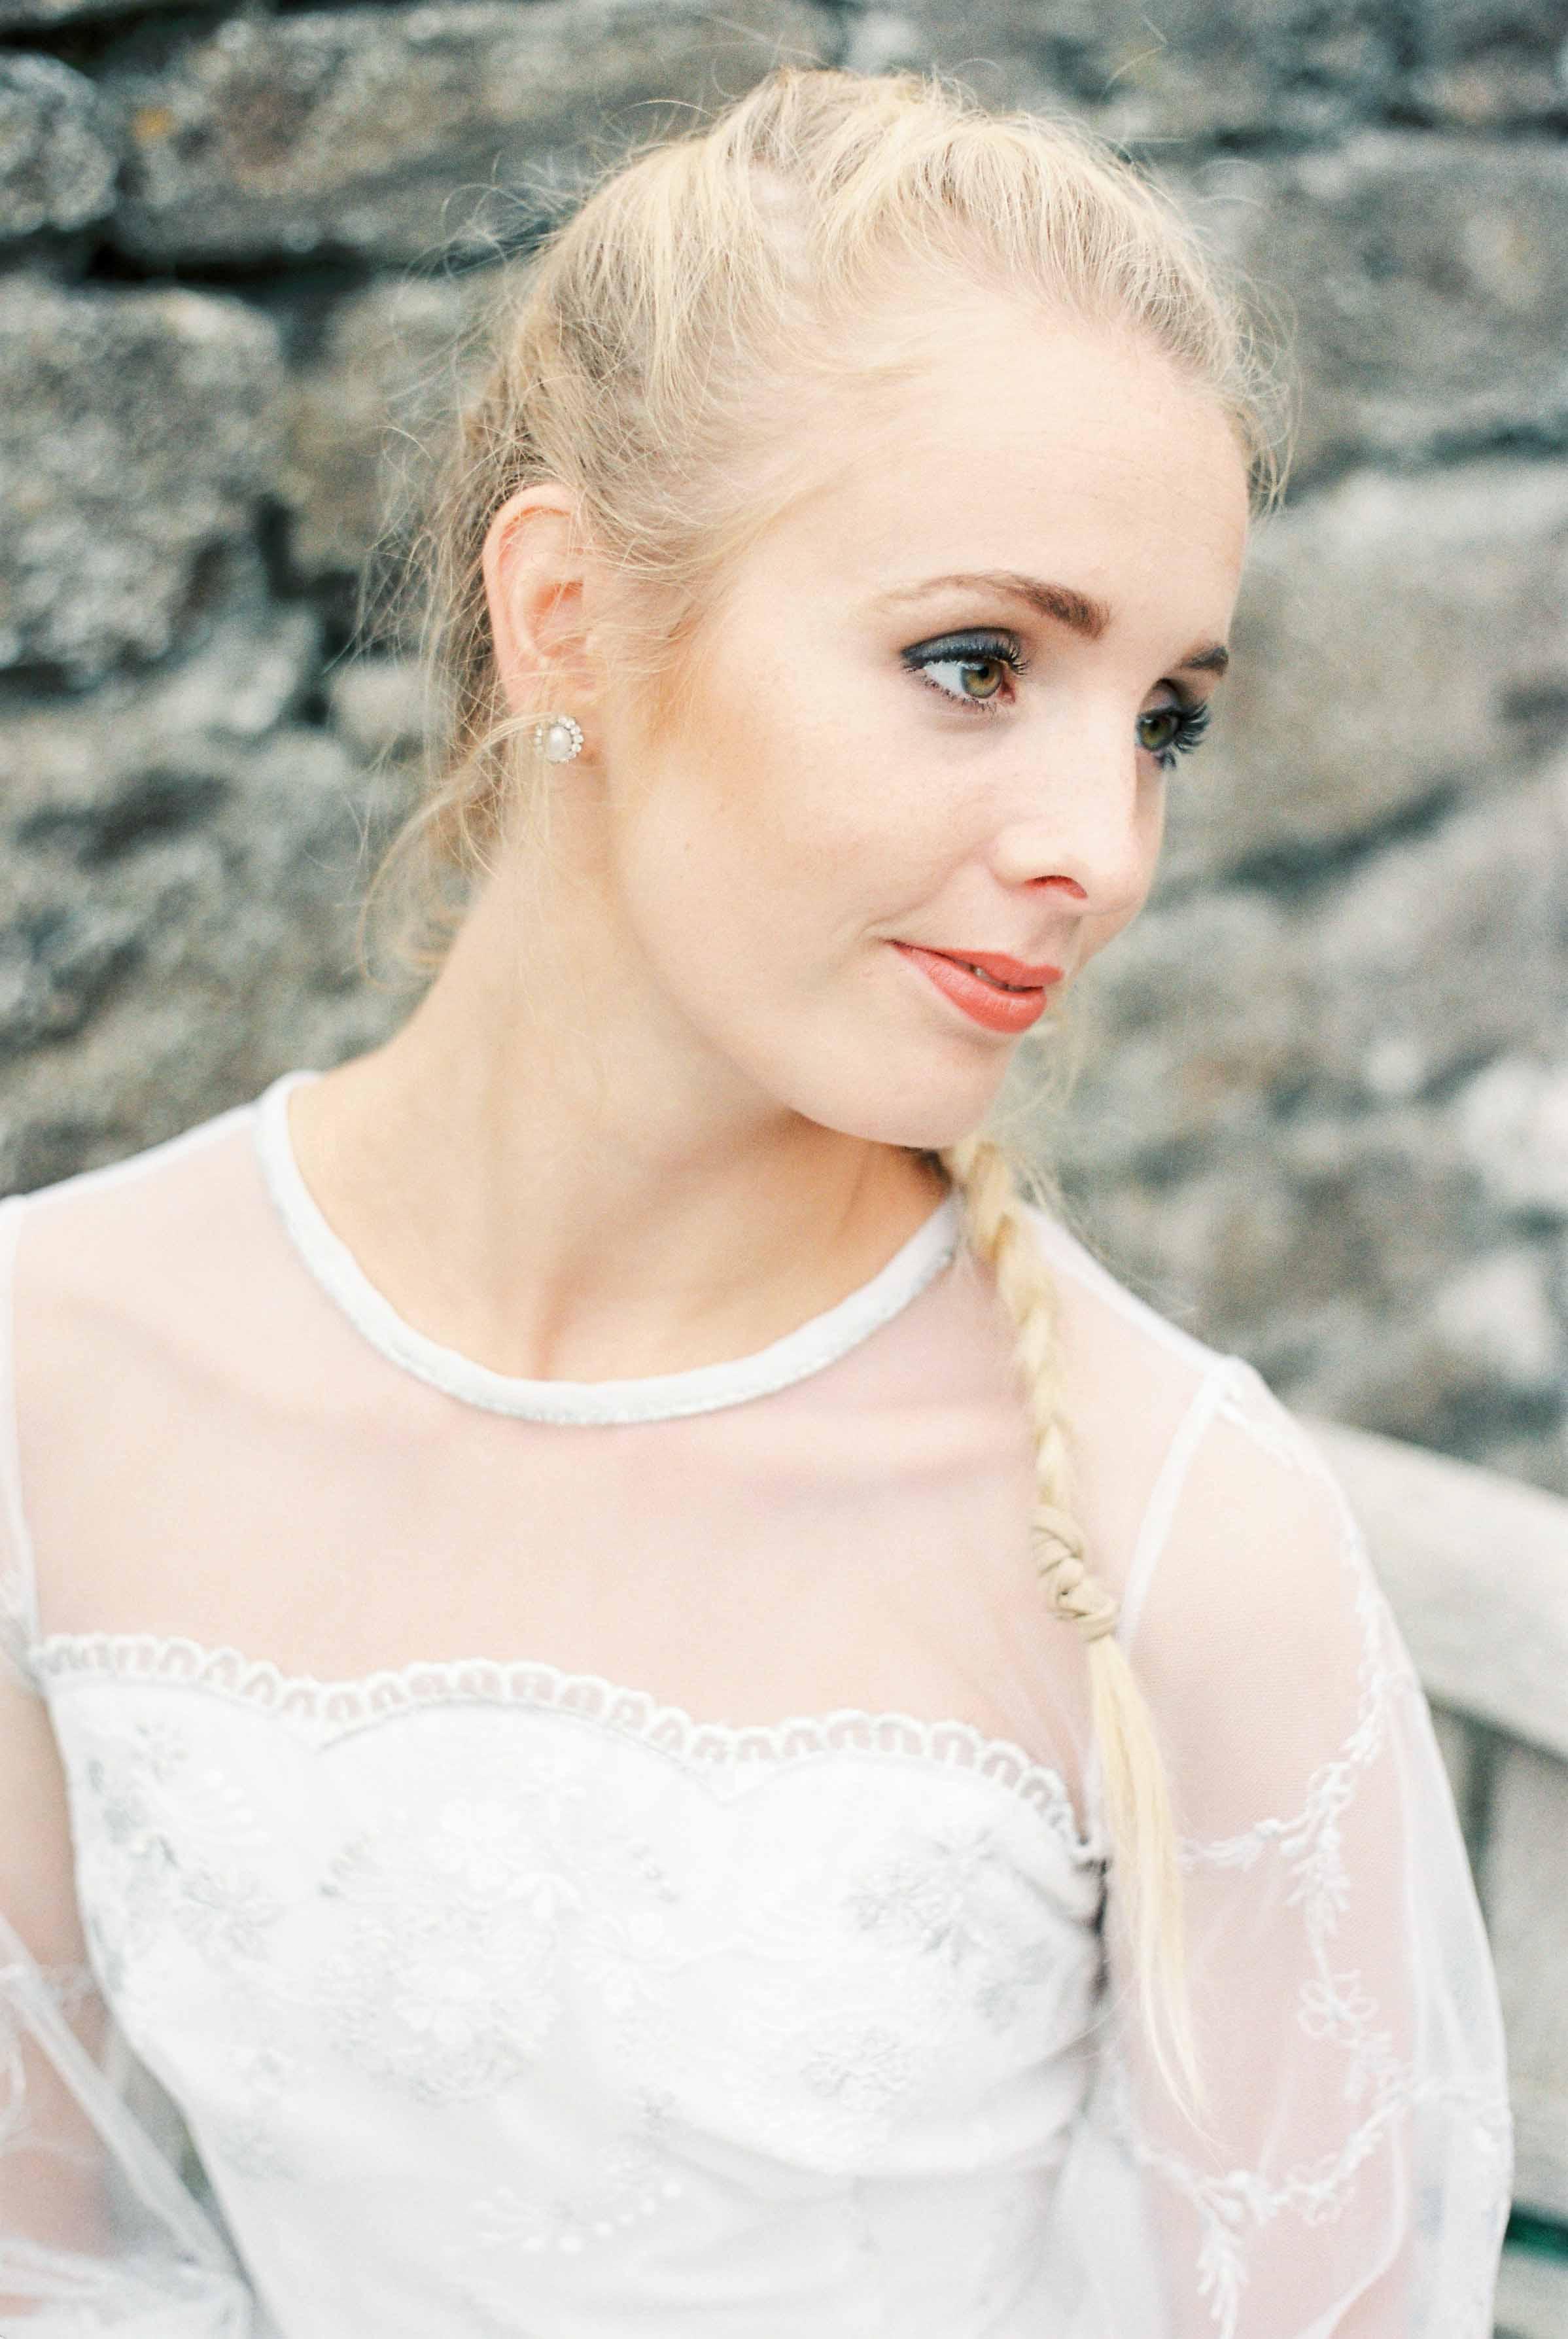 dorset-fine-art-wedding-photographer_amelia_carmencita_lores-9-of-24